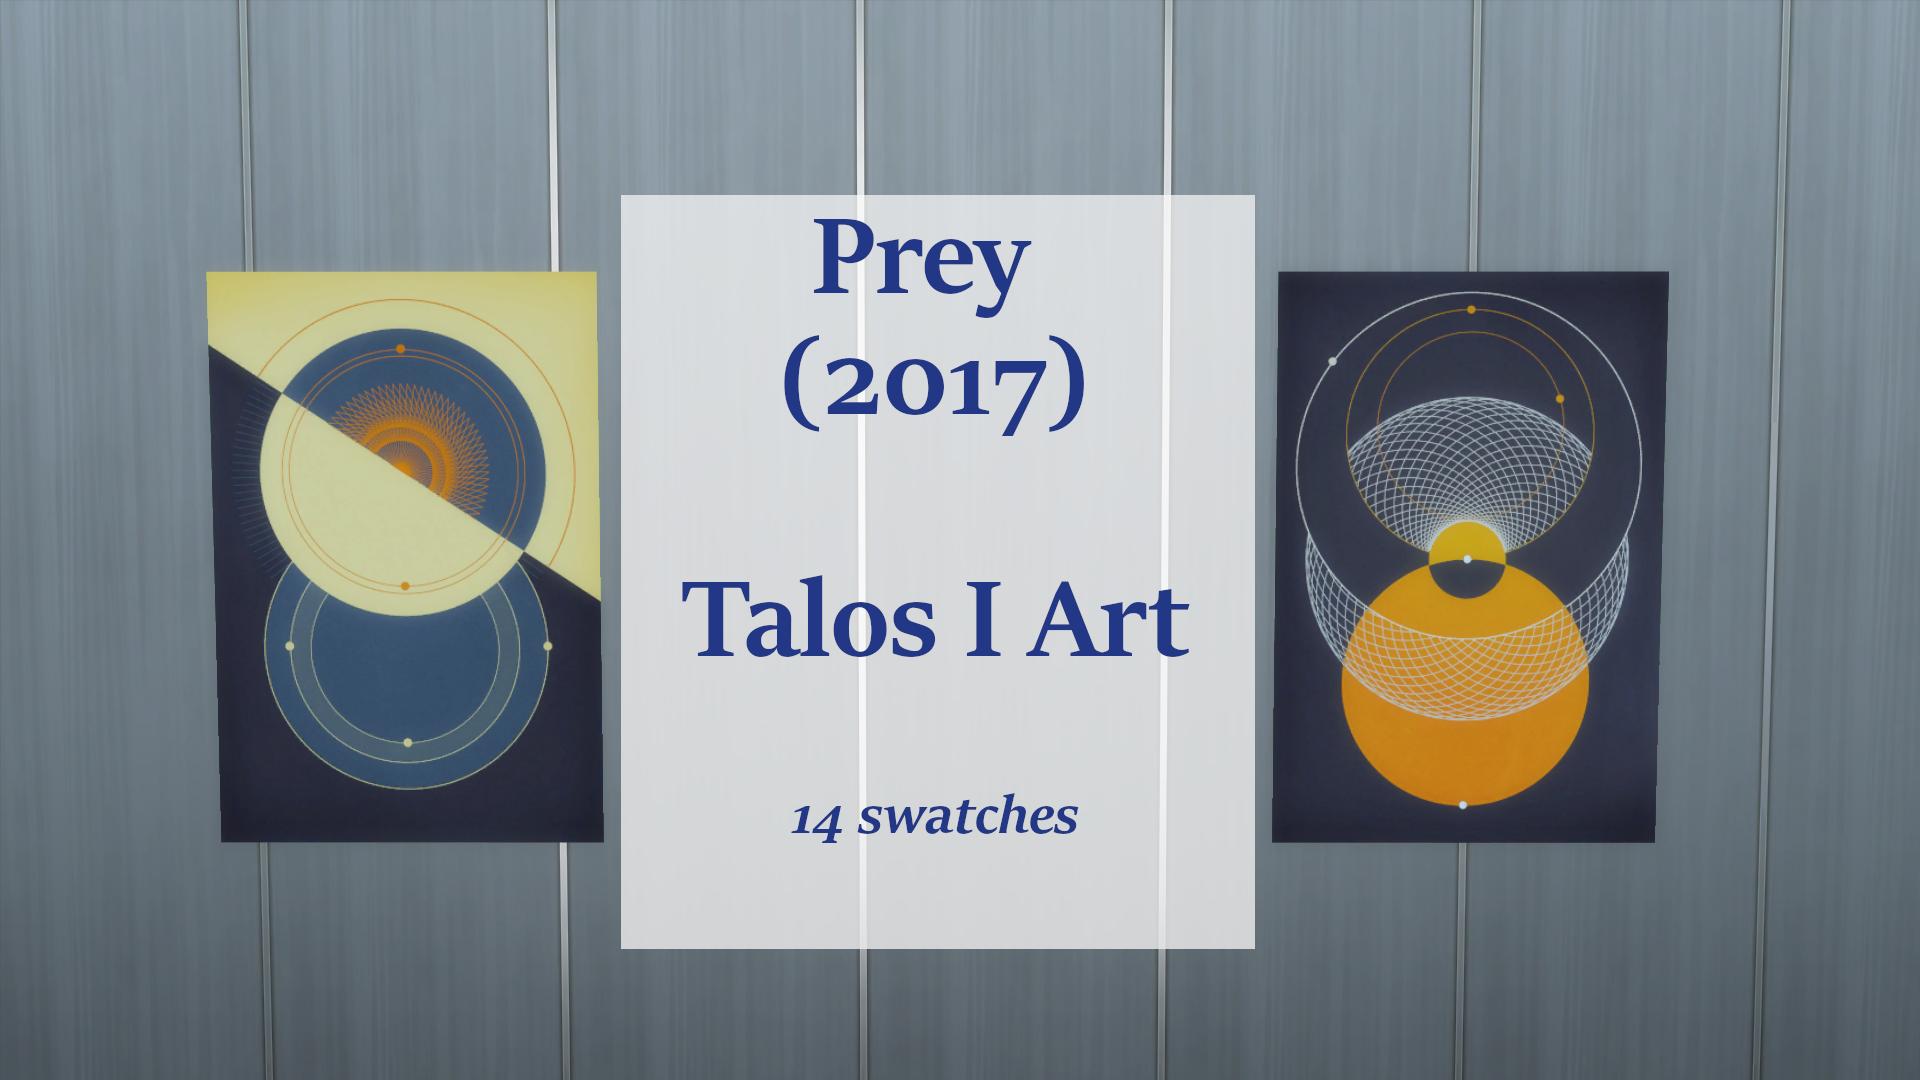 ModTheSims - Prey - Talos I Artwork